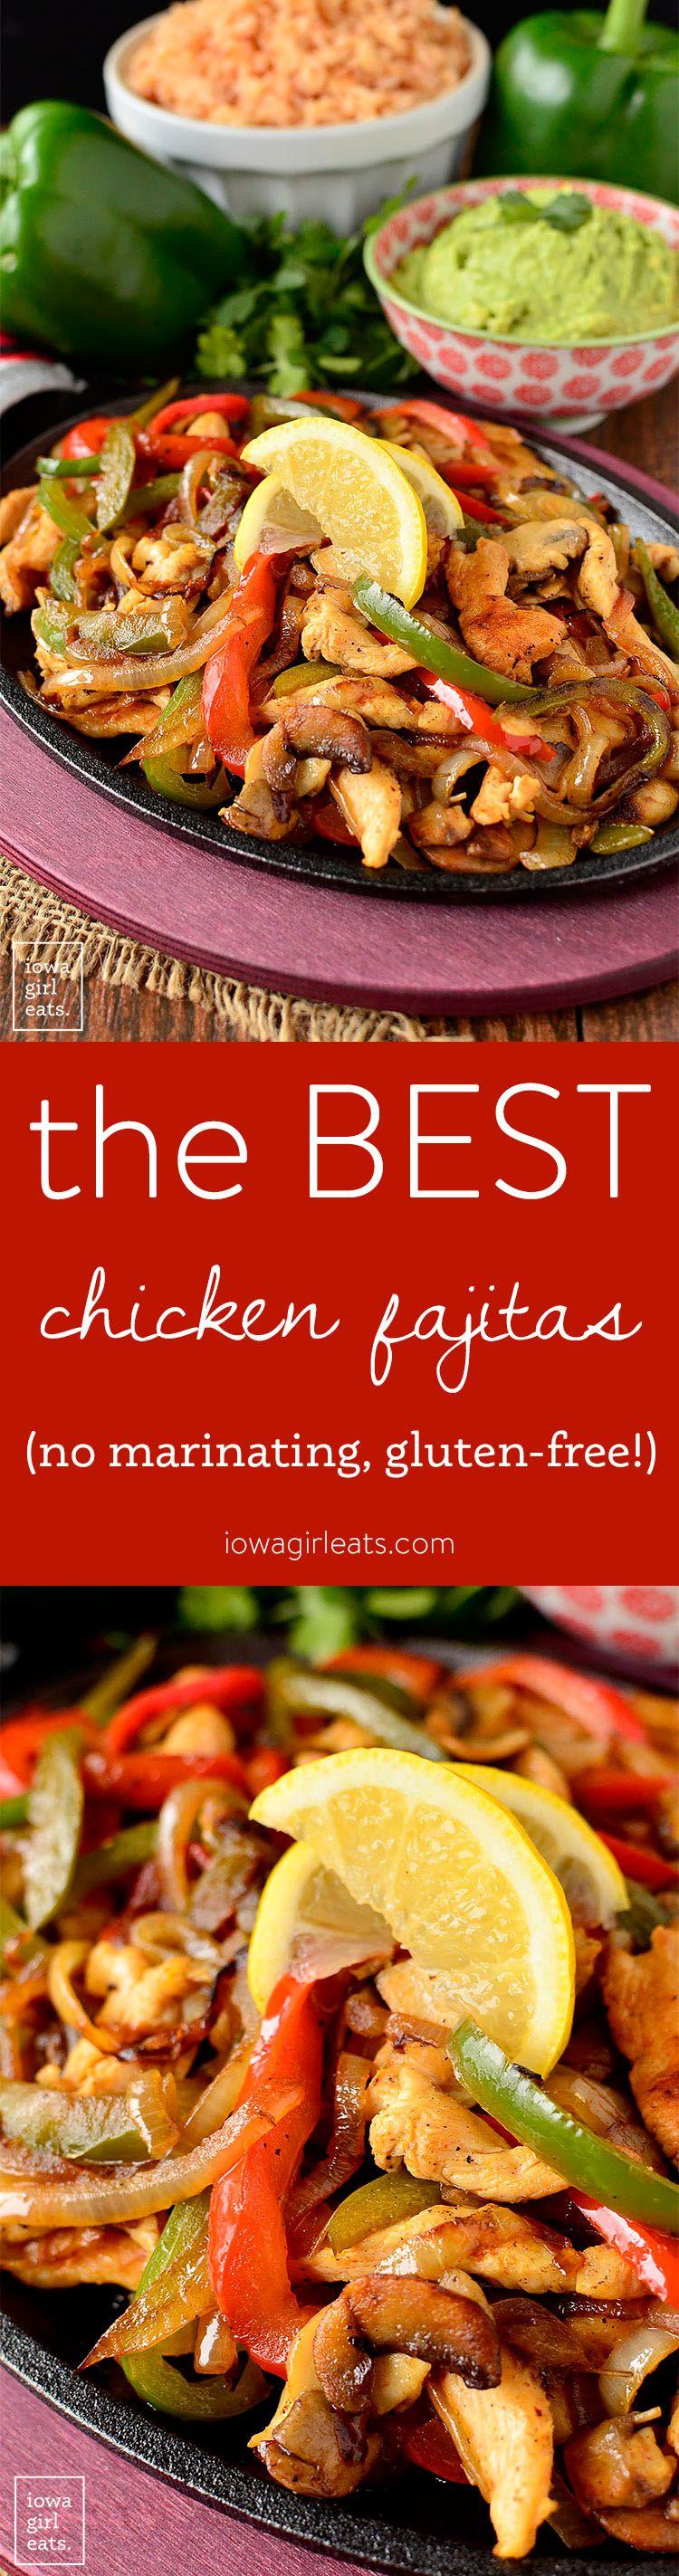 The Best Chicken Fajitas Iowa Girl Eats Recipe Recipes Chicken Fajitas Food